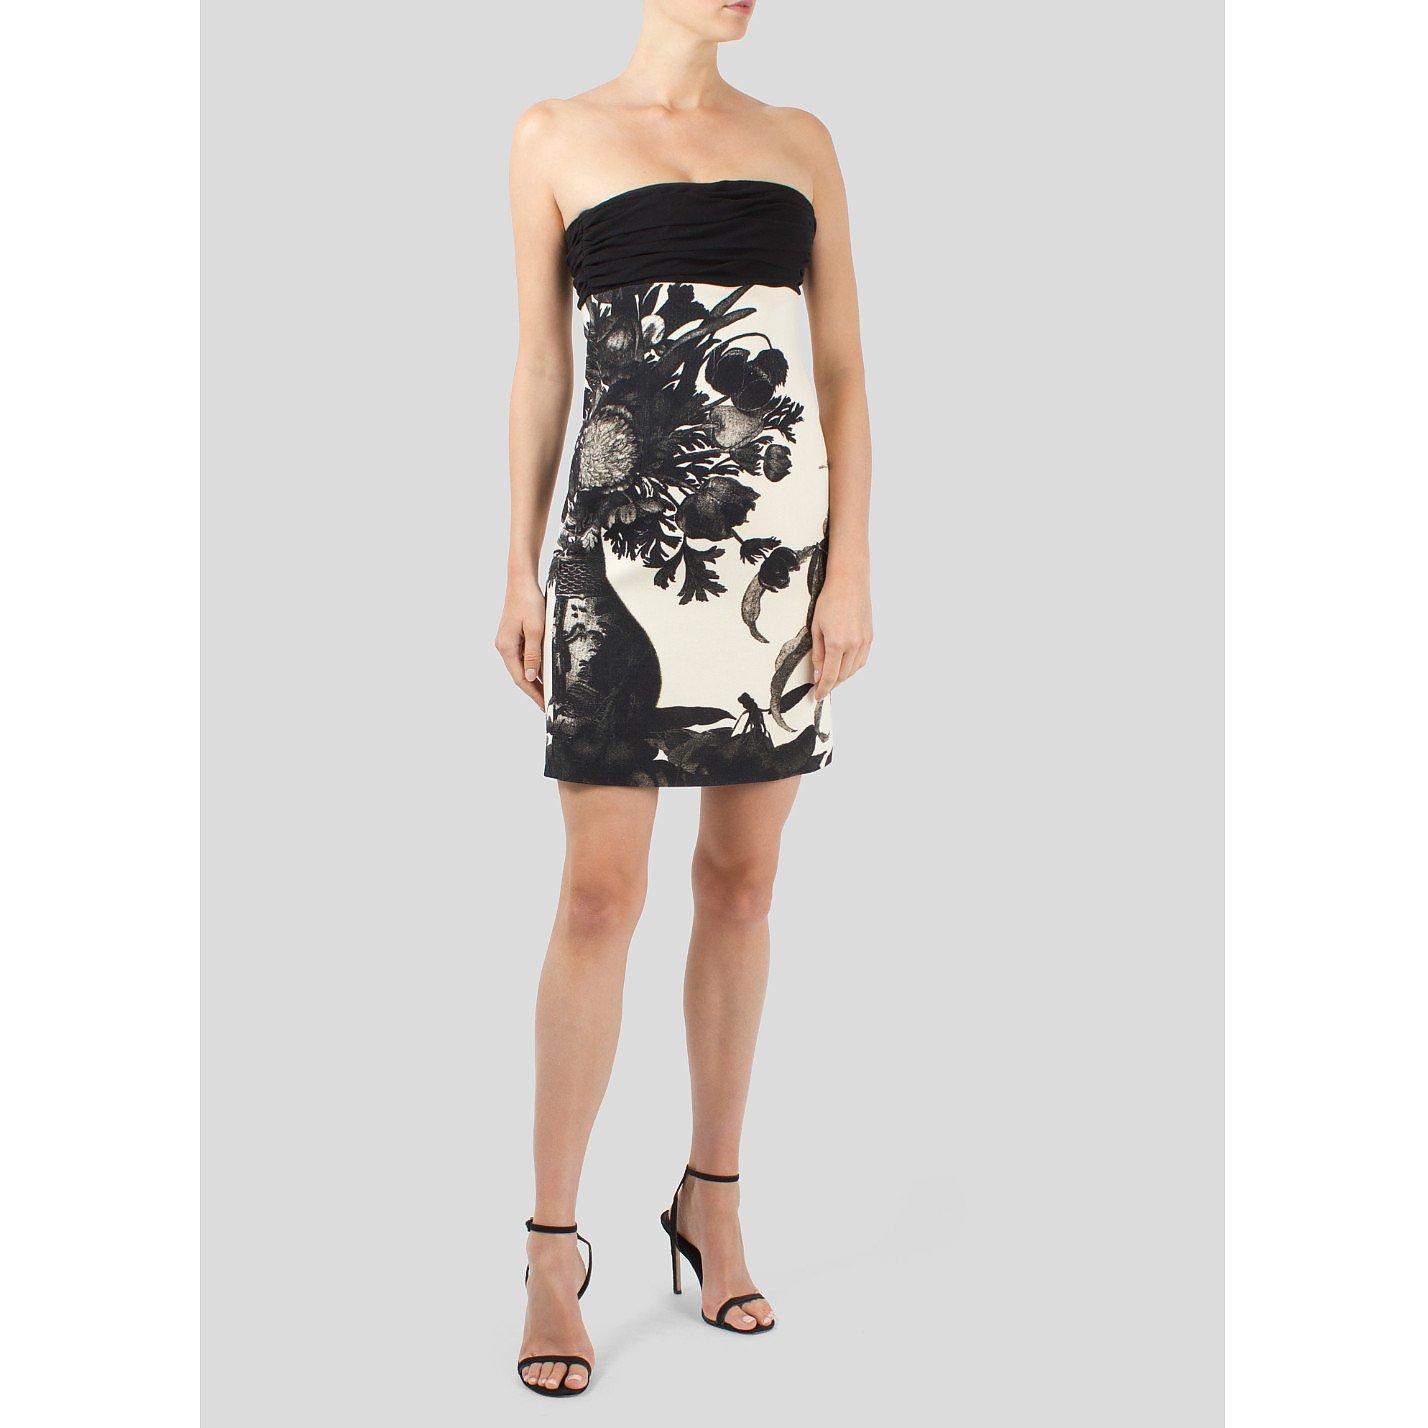 Giambattista Valli Strapless Floral Mini Dress